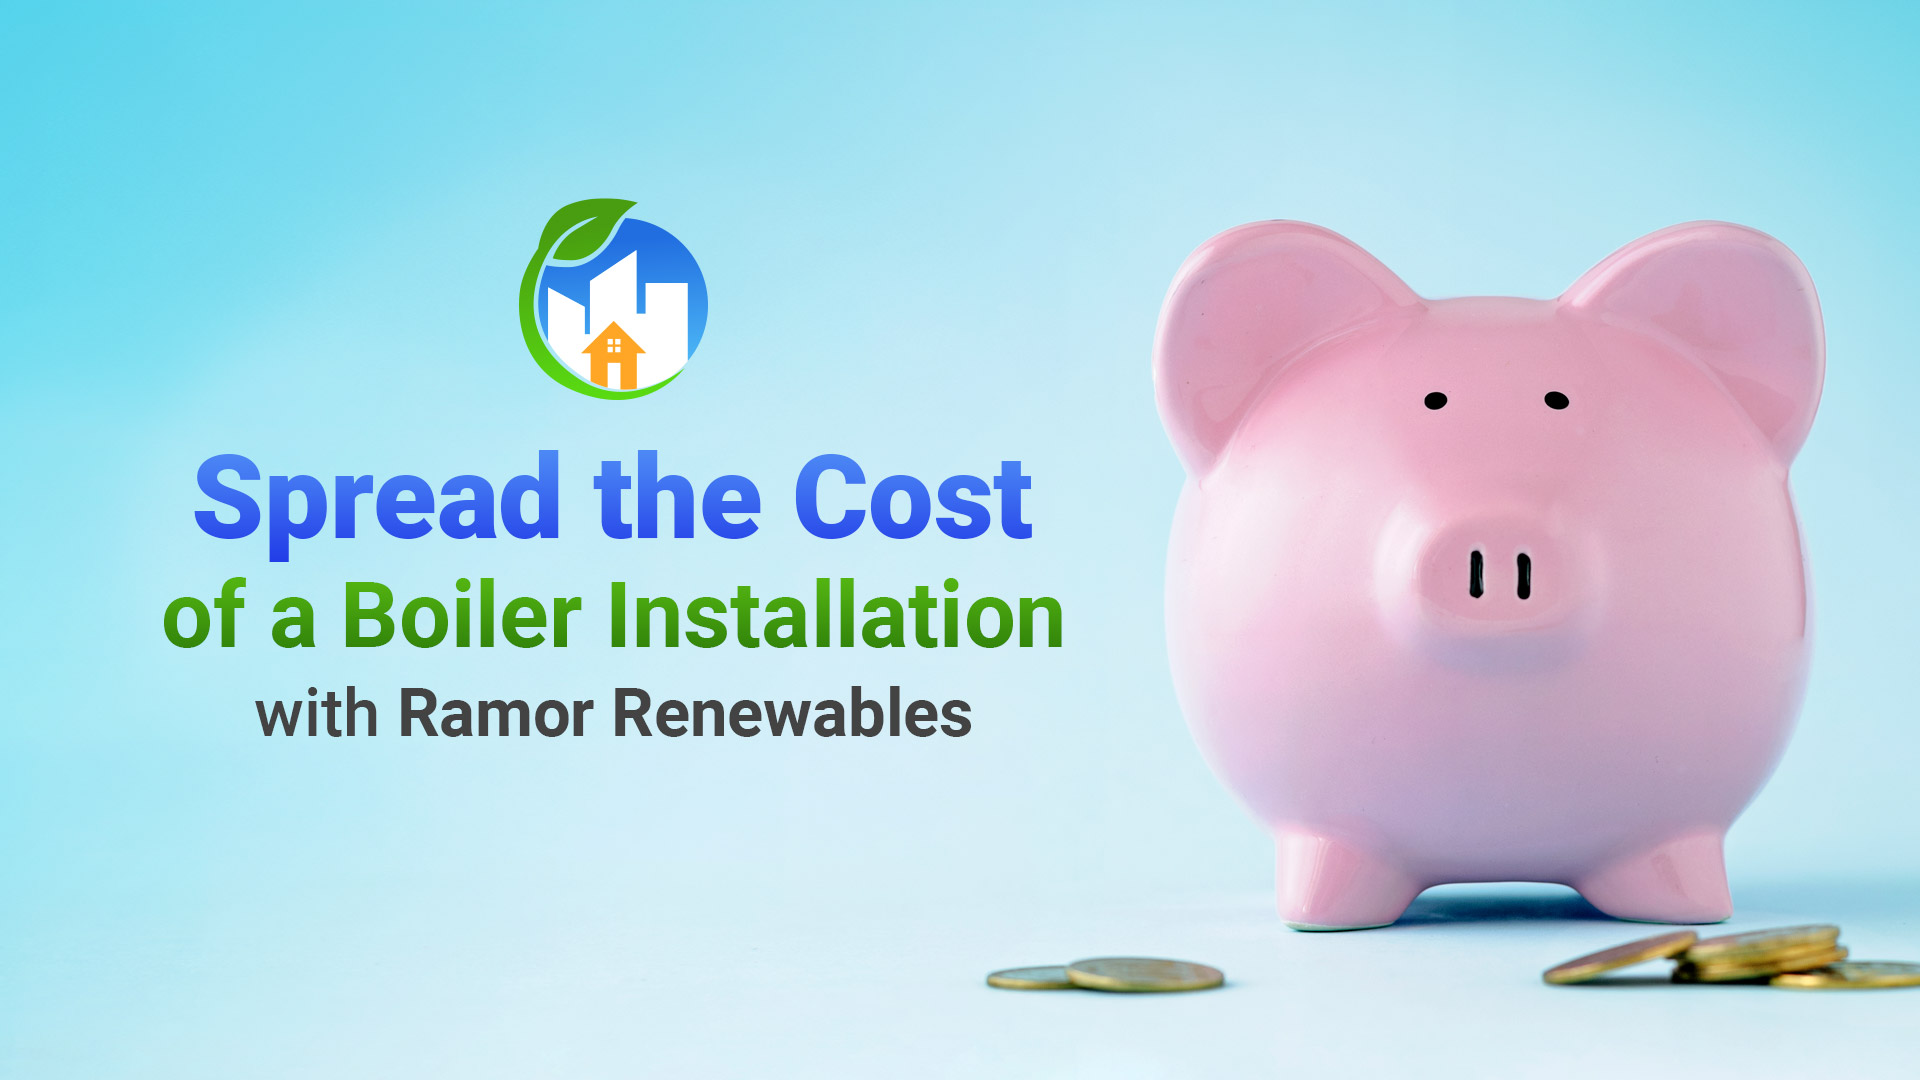 Spread cost of boiler installation